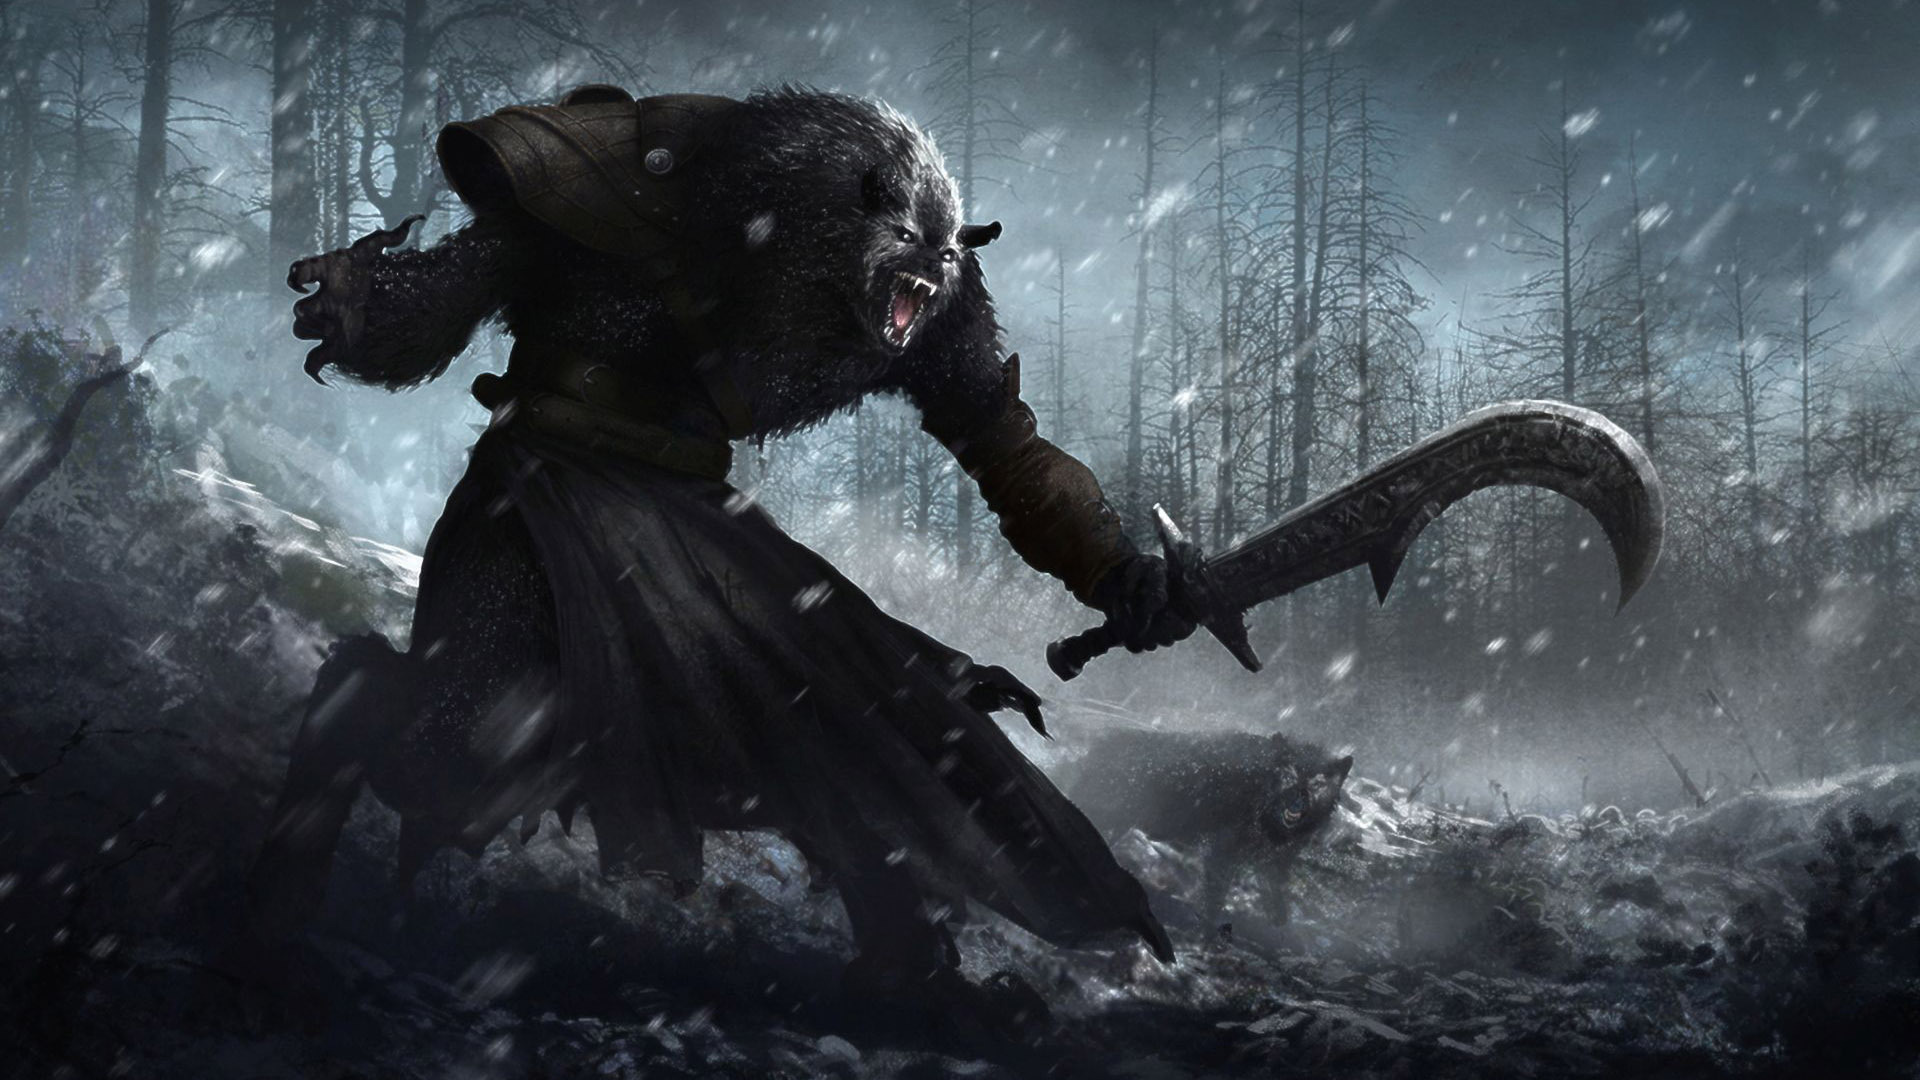 grim reaper hd wallpaper download